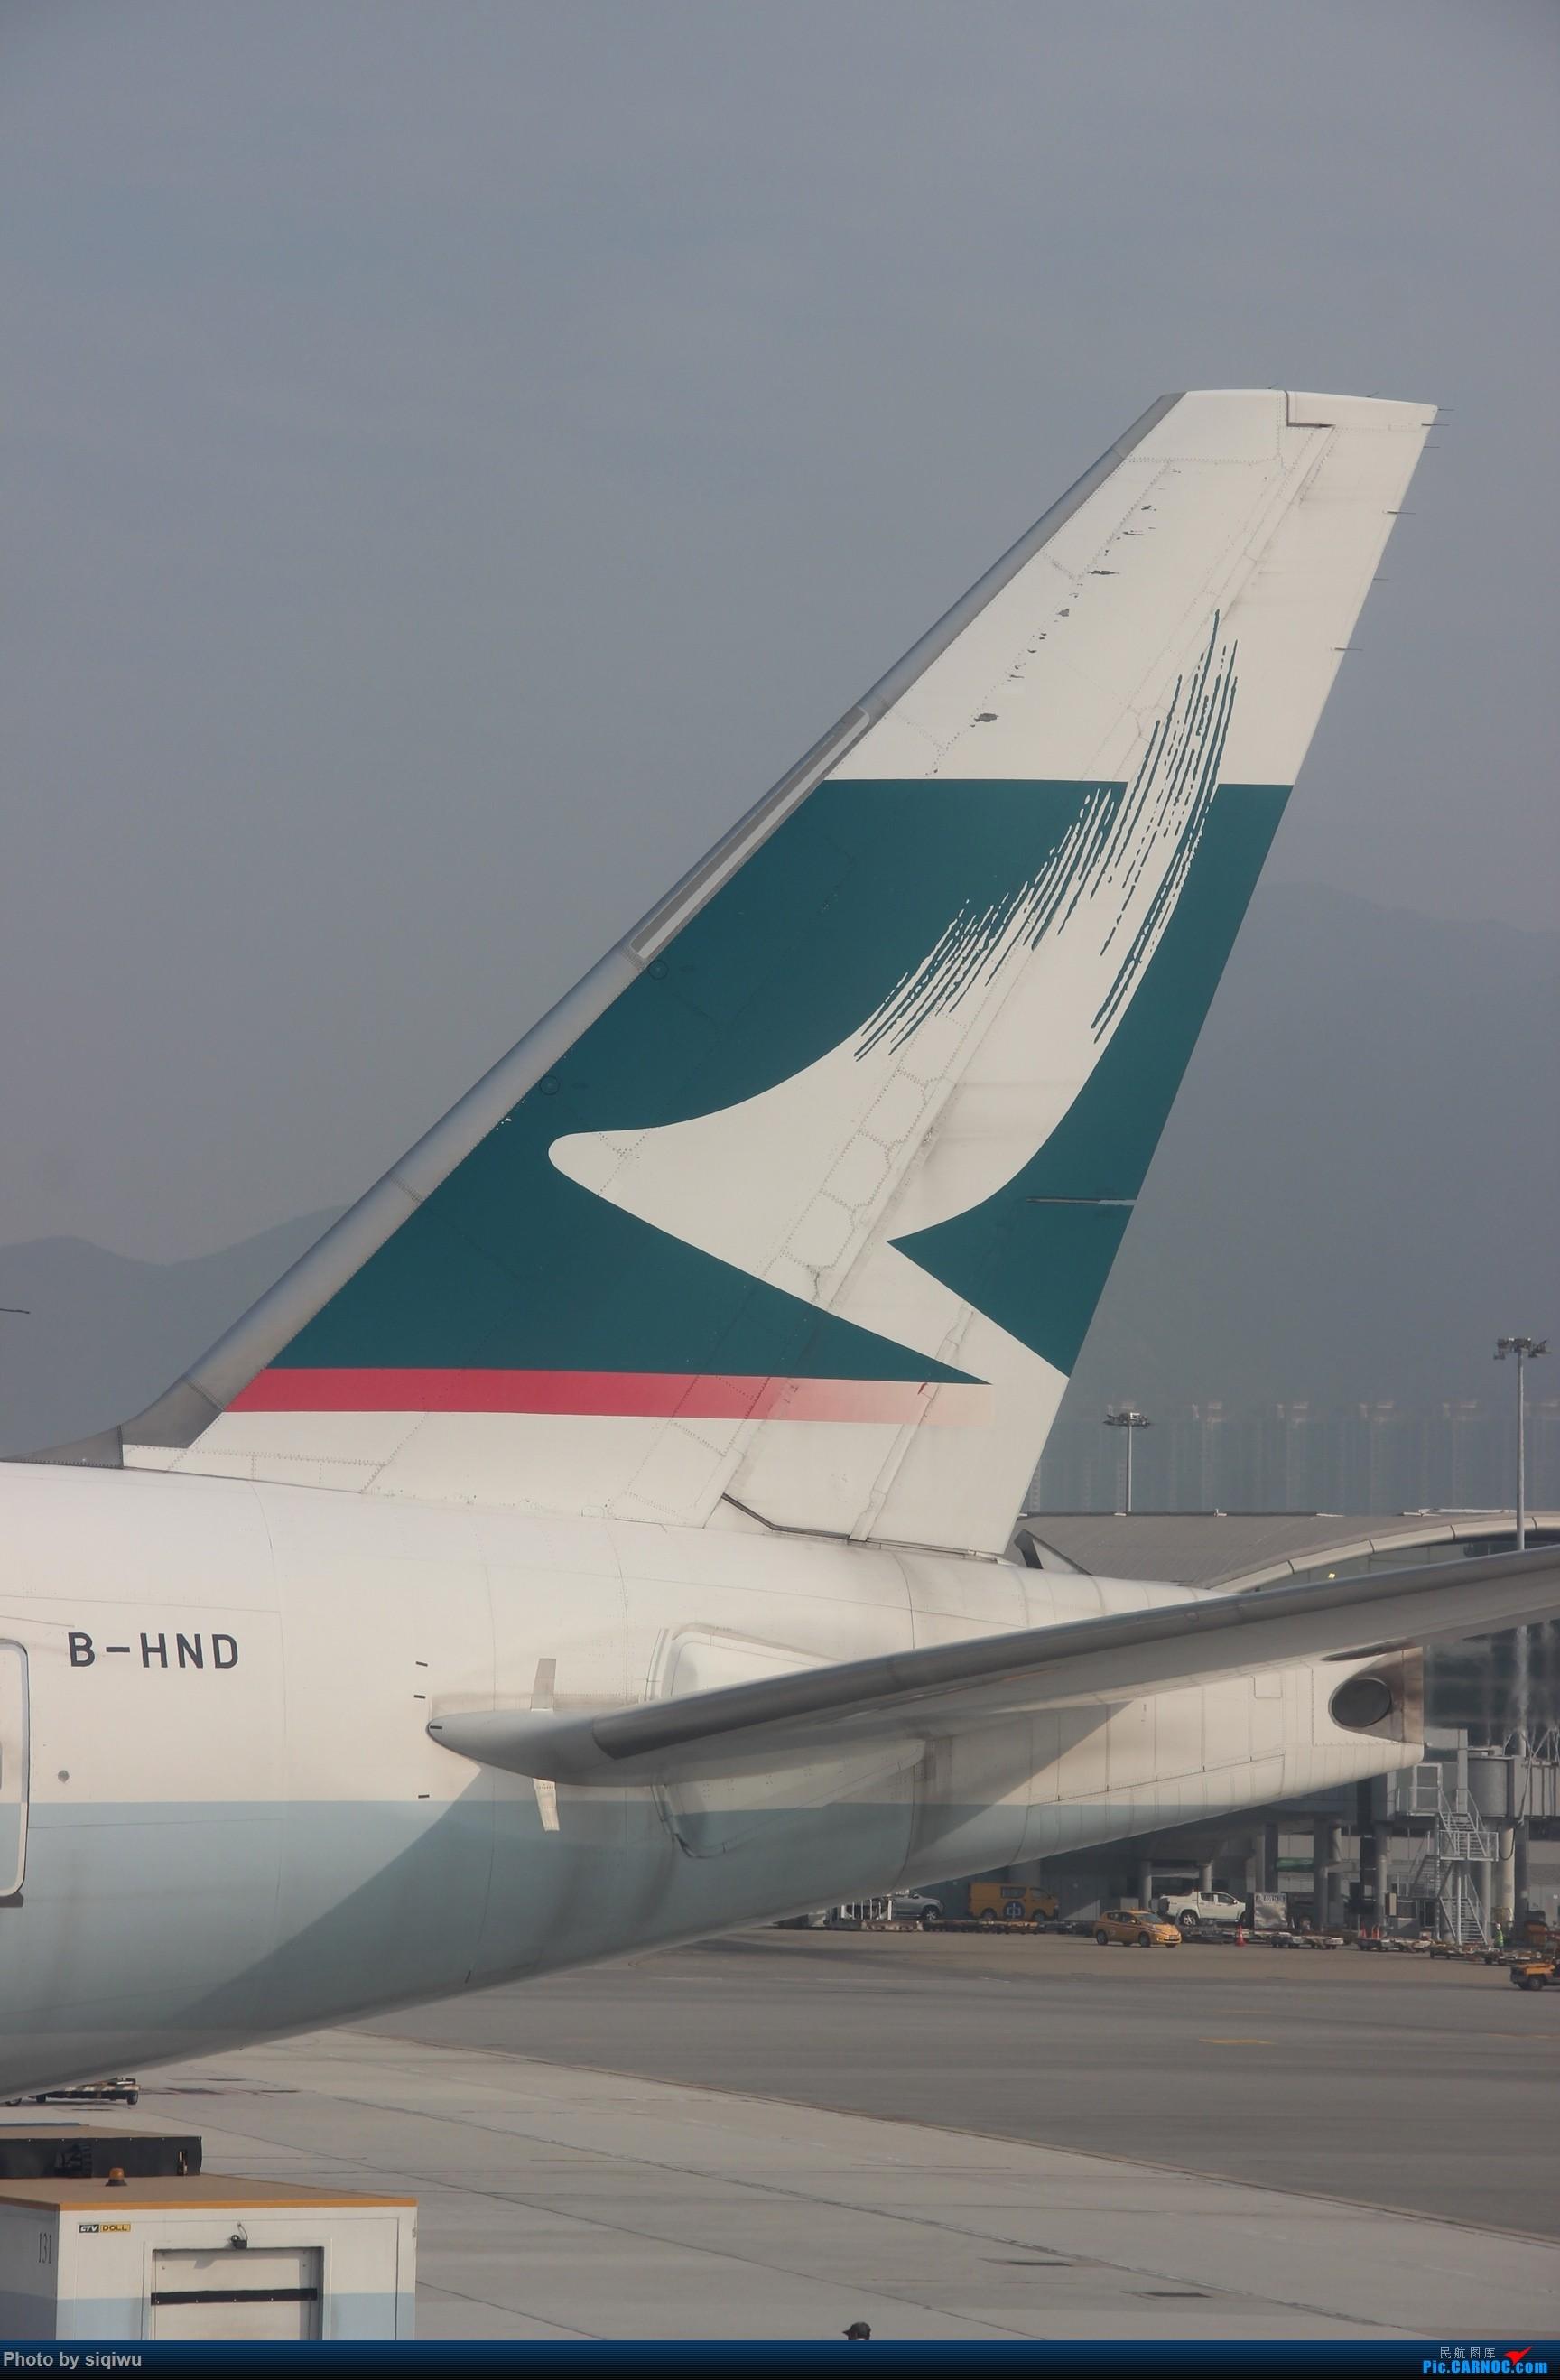 Re:[原创]PVG-HKG-KUL-HKG-PVG 四天往返,CX/KA AIRBUS A330-300  中国香港国际机场